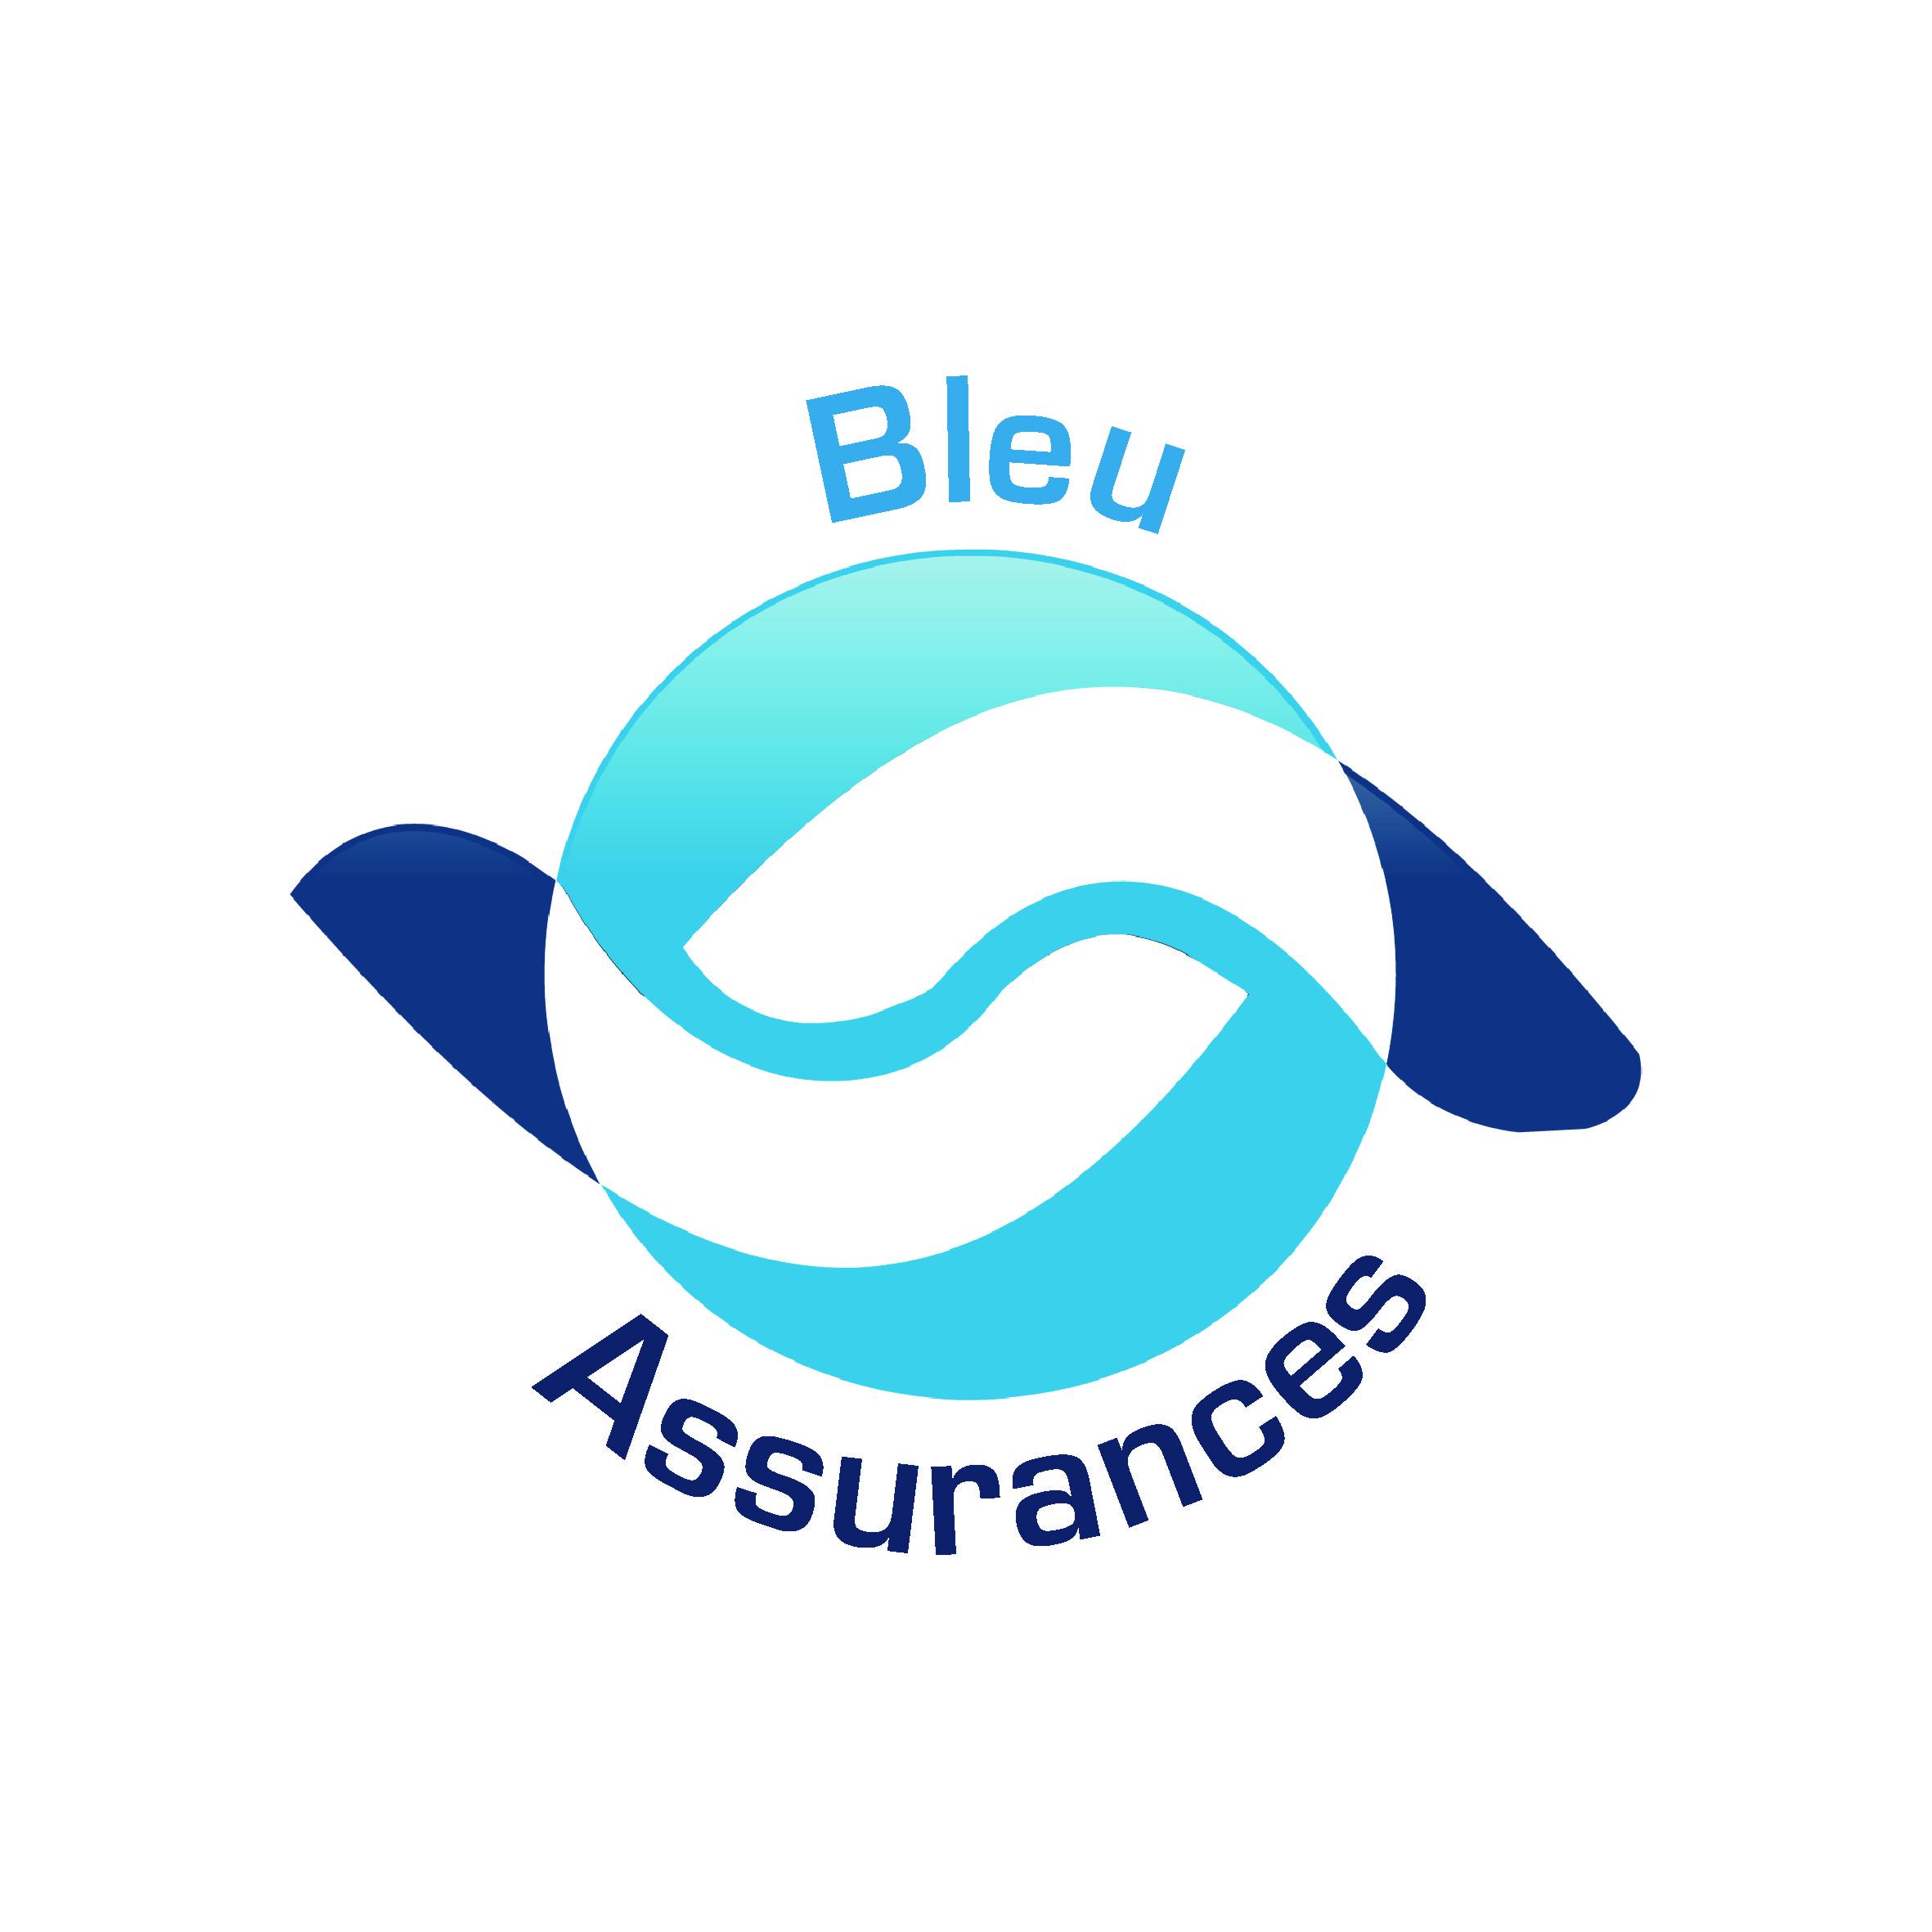 Bleu Assurances